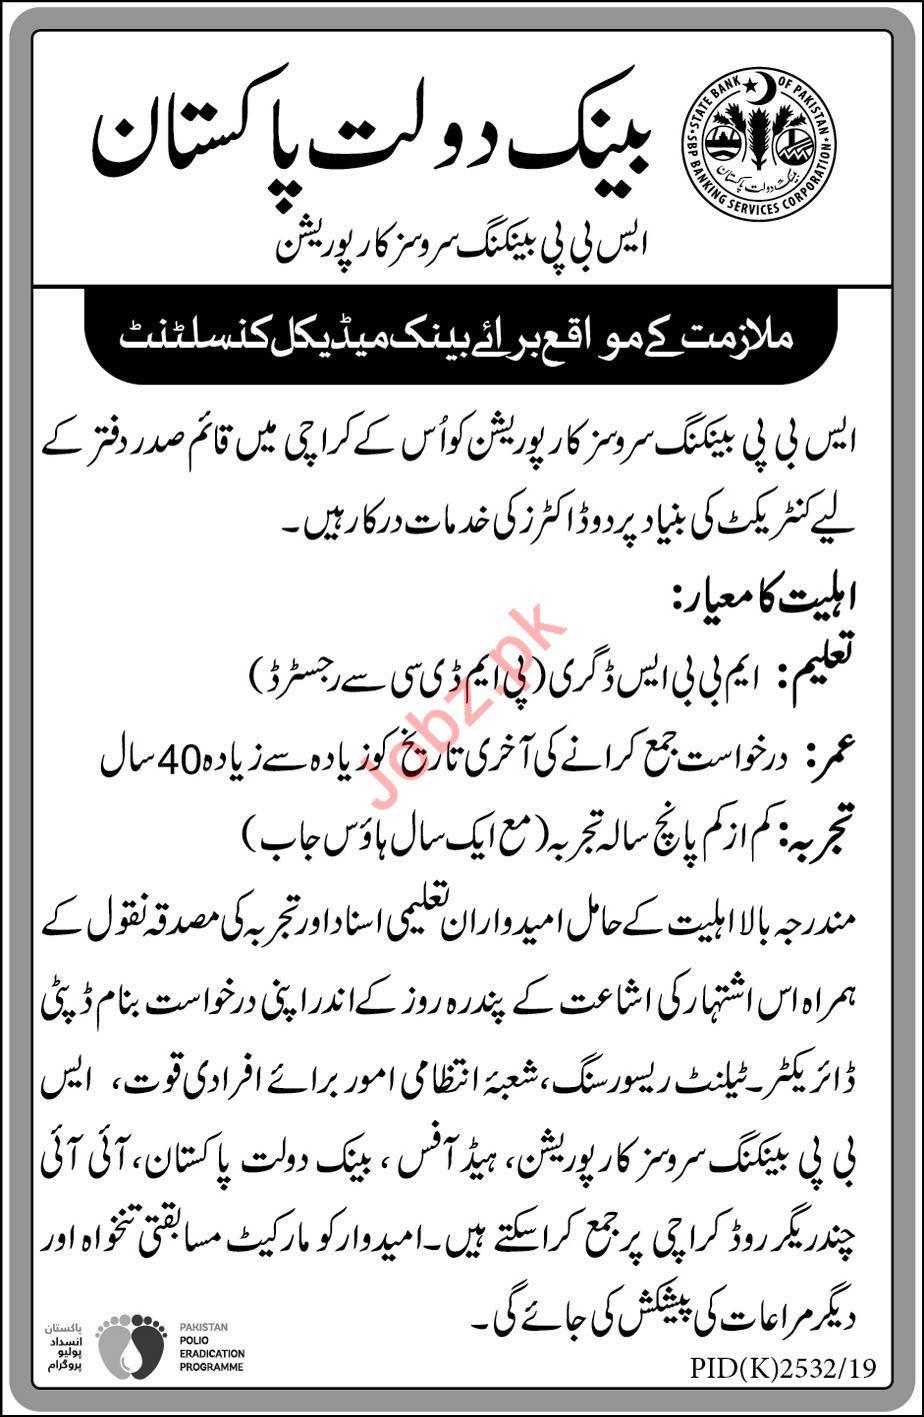 State Bank of Pakistan Jobs 2020 in Karachi